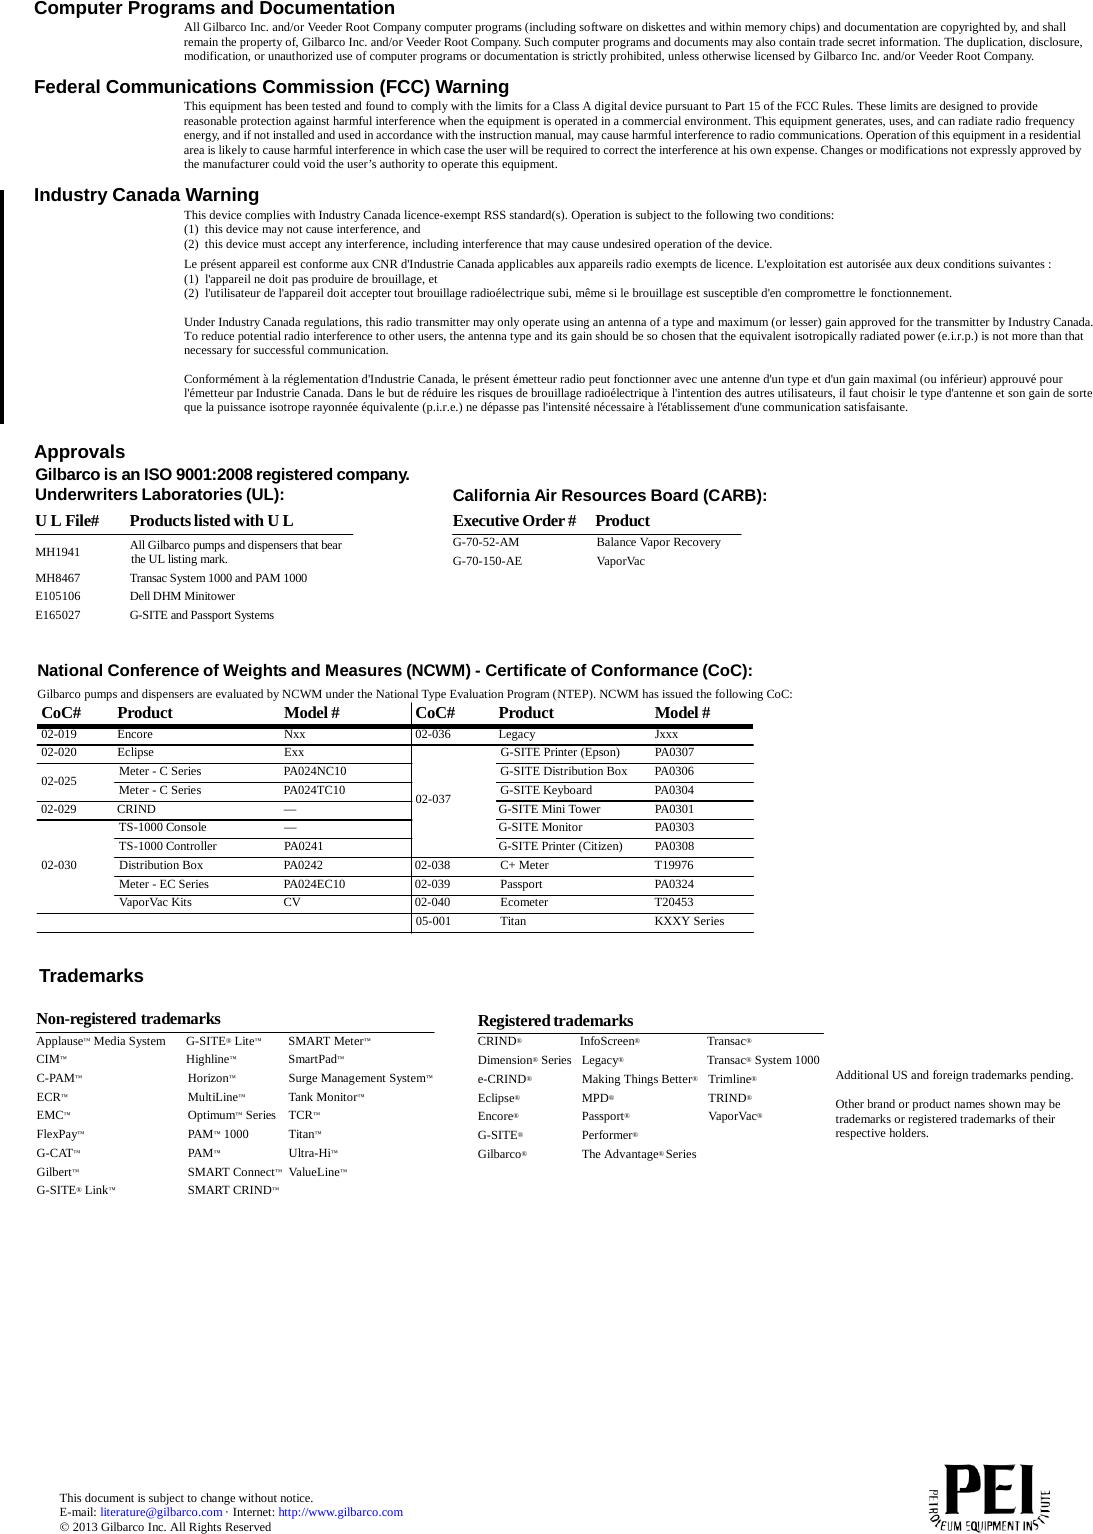 Gilbarco LFADV RFID Module User Manual 13 0074 Exhibit Cover